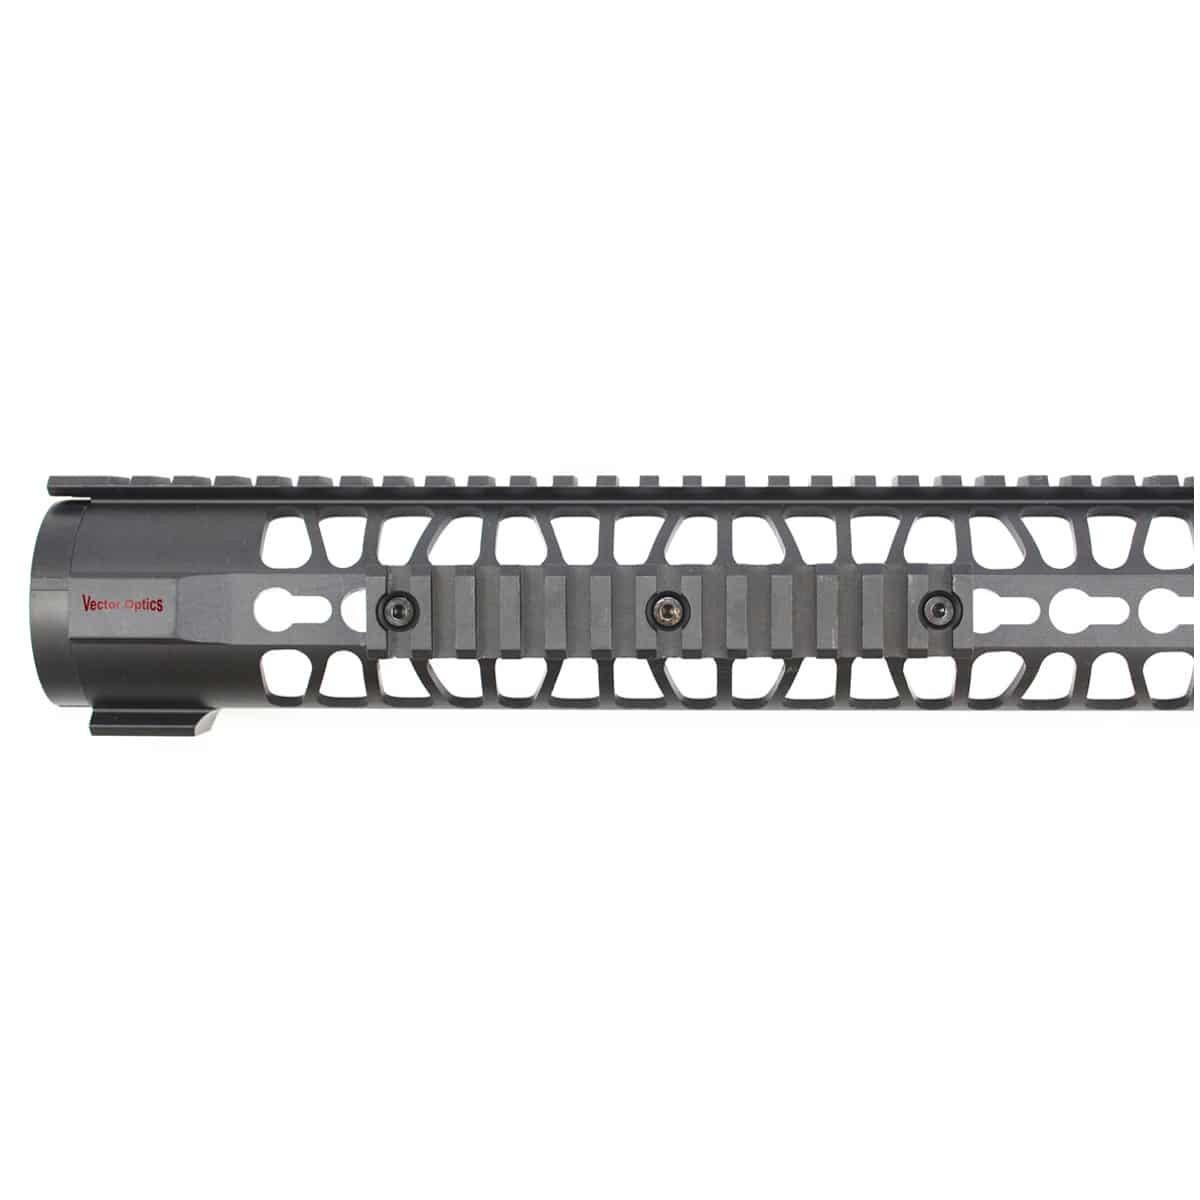 Key Mod Free Float 15'' Handguard Rail Mount